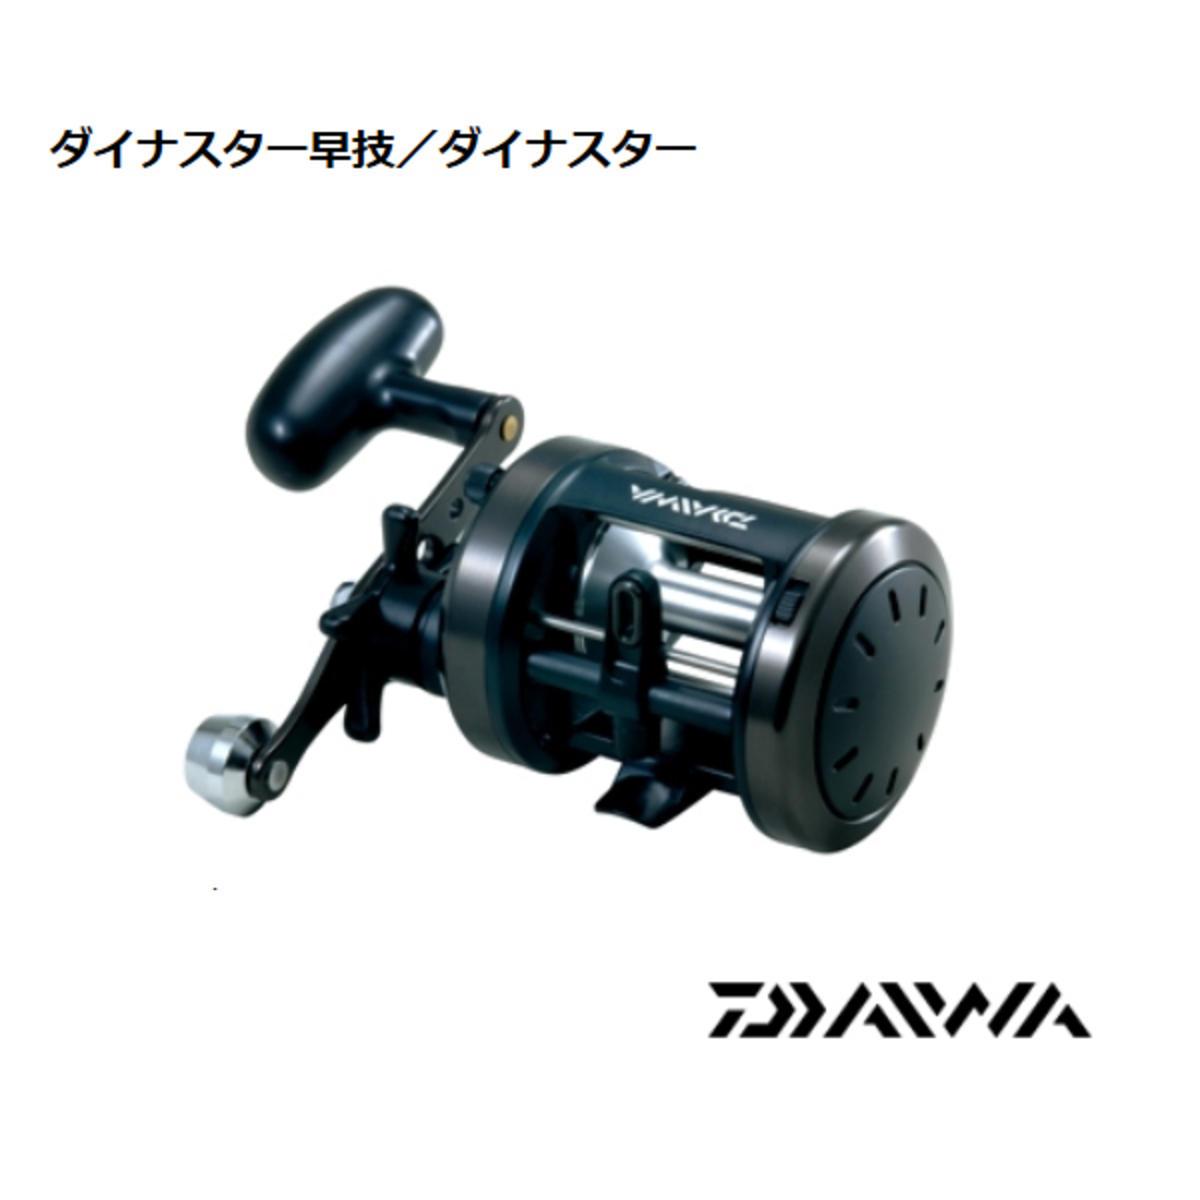 Ex Display Daiwa Dynastar RHW Multiplier Reel D300, JDM REEL